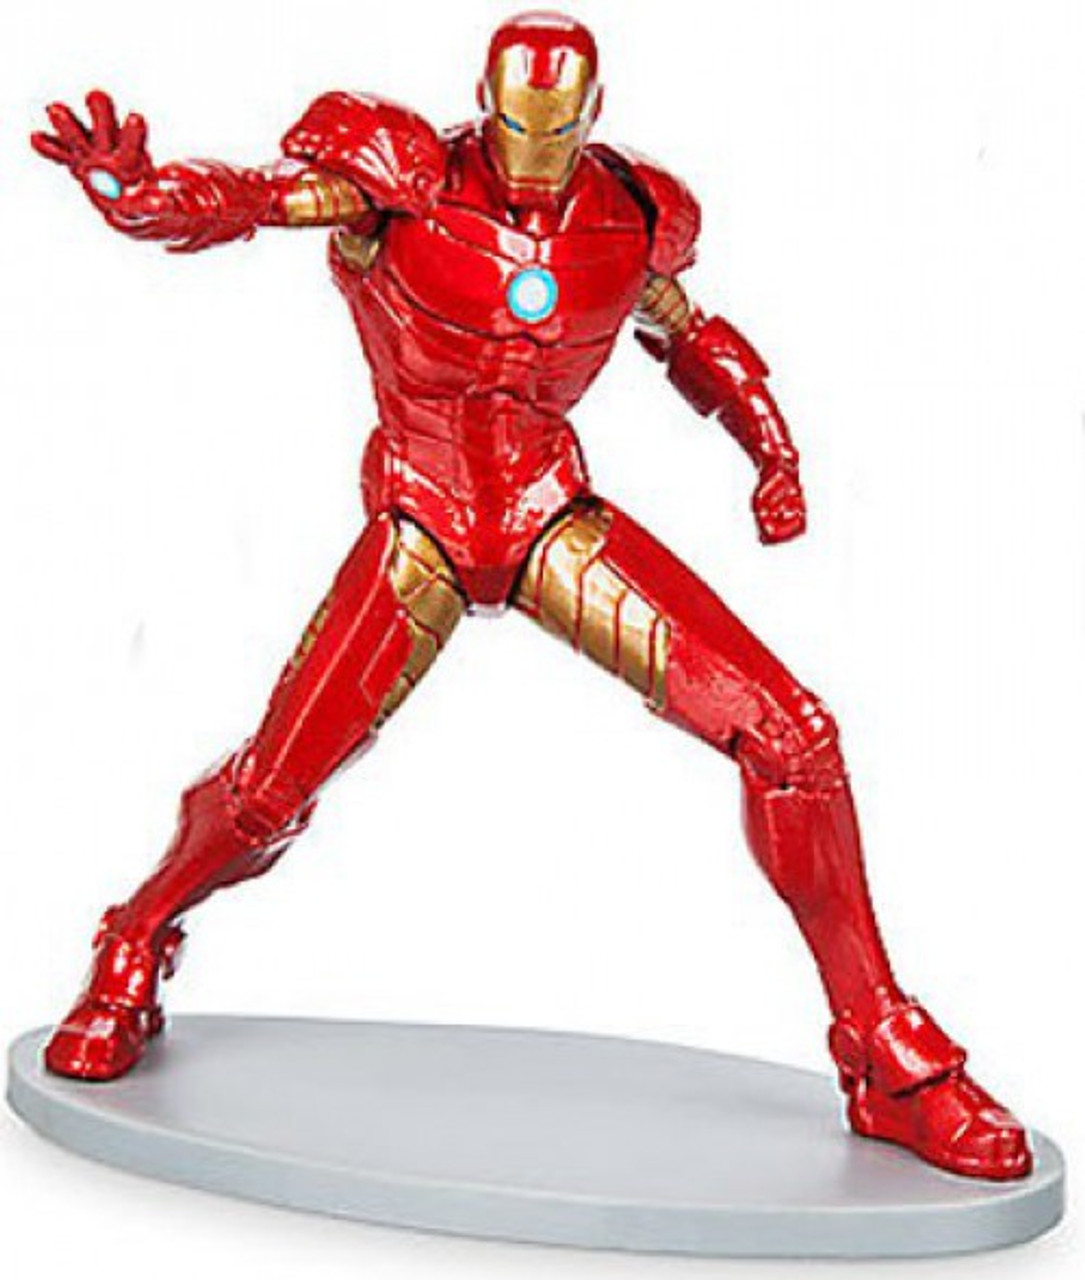 Loose Homecoming Iron Man Mark 47 3.5-Inch PVC Figure Marvel Spider-Man